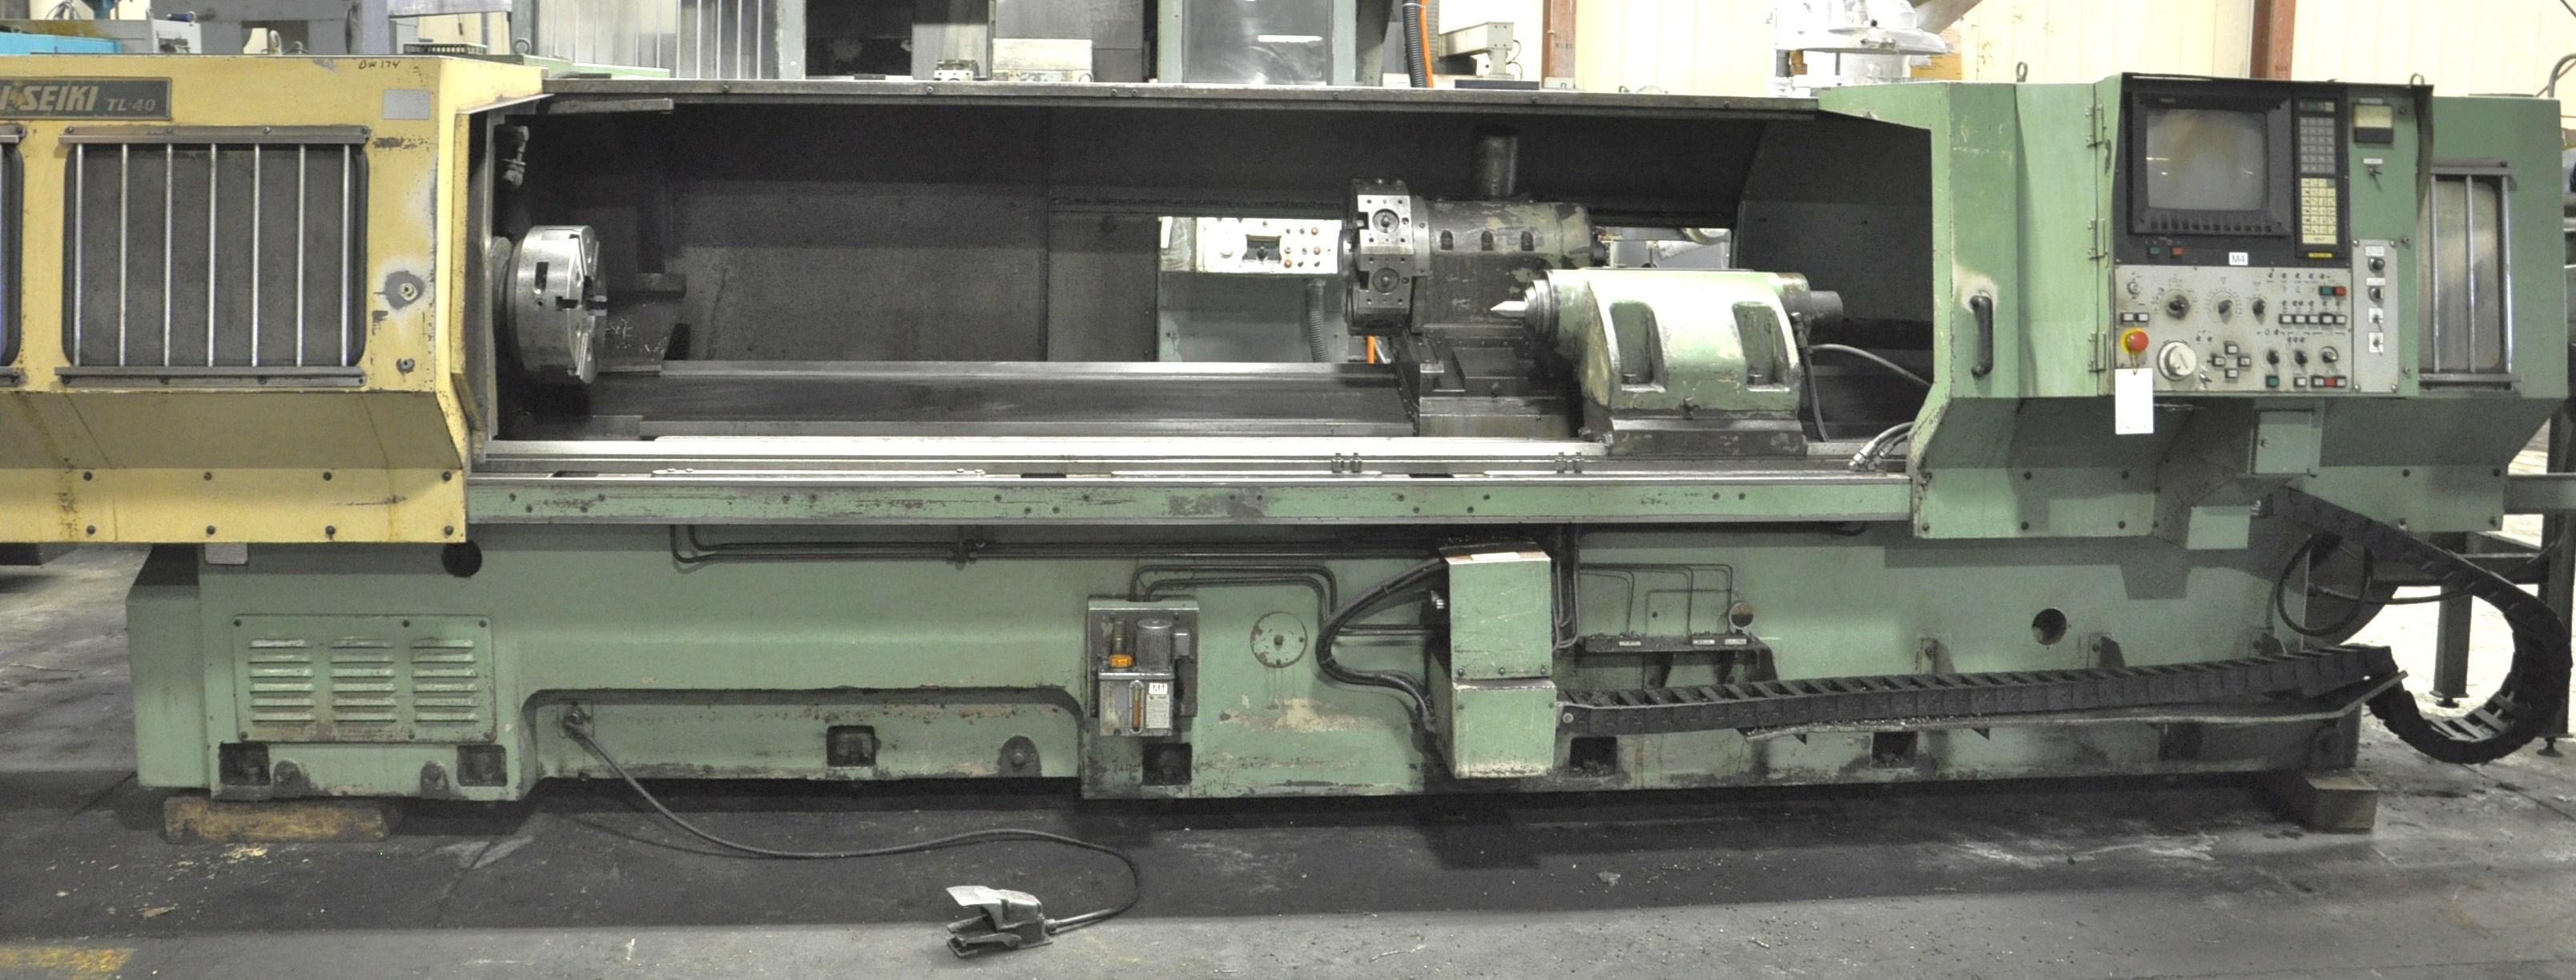 Used Mori Seiki TL40B 3750 Cnc lathe - Exapro